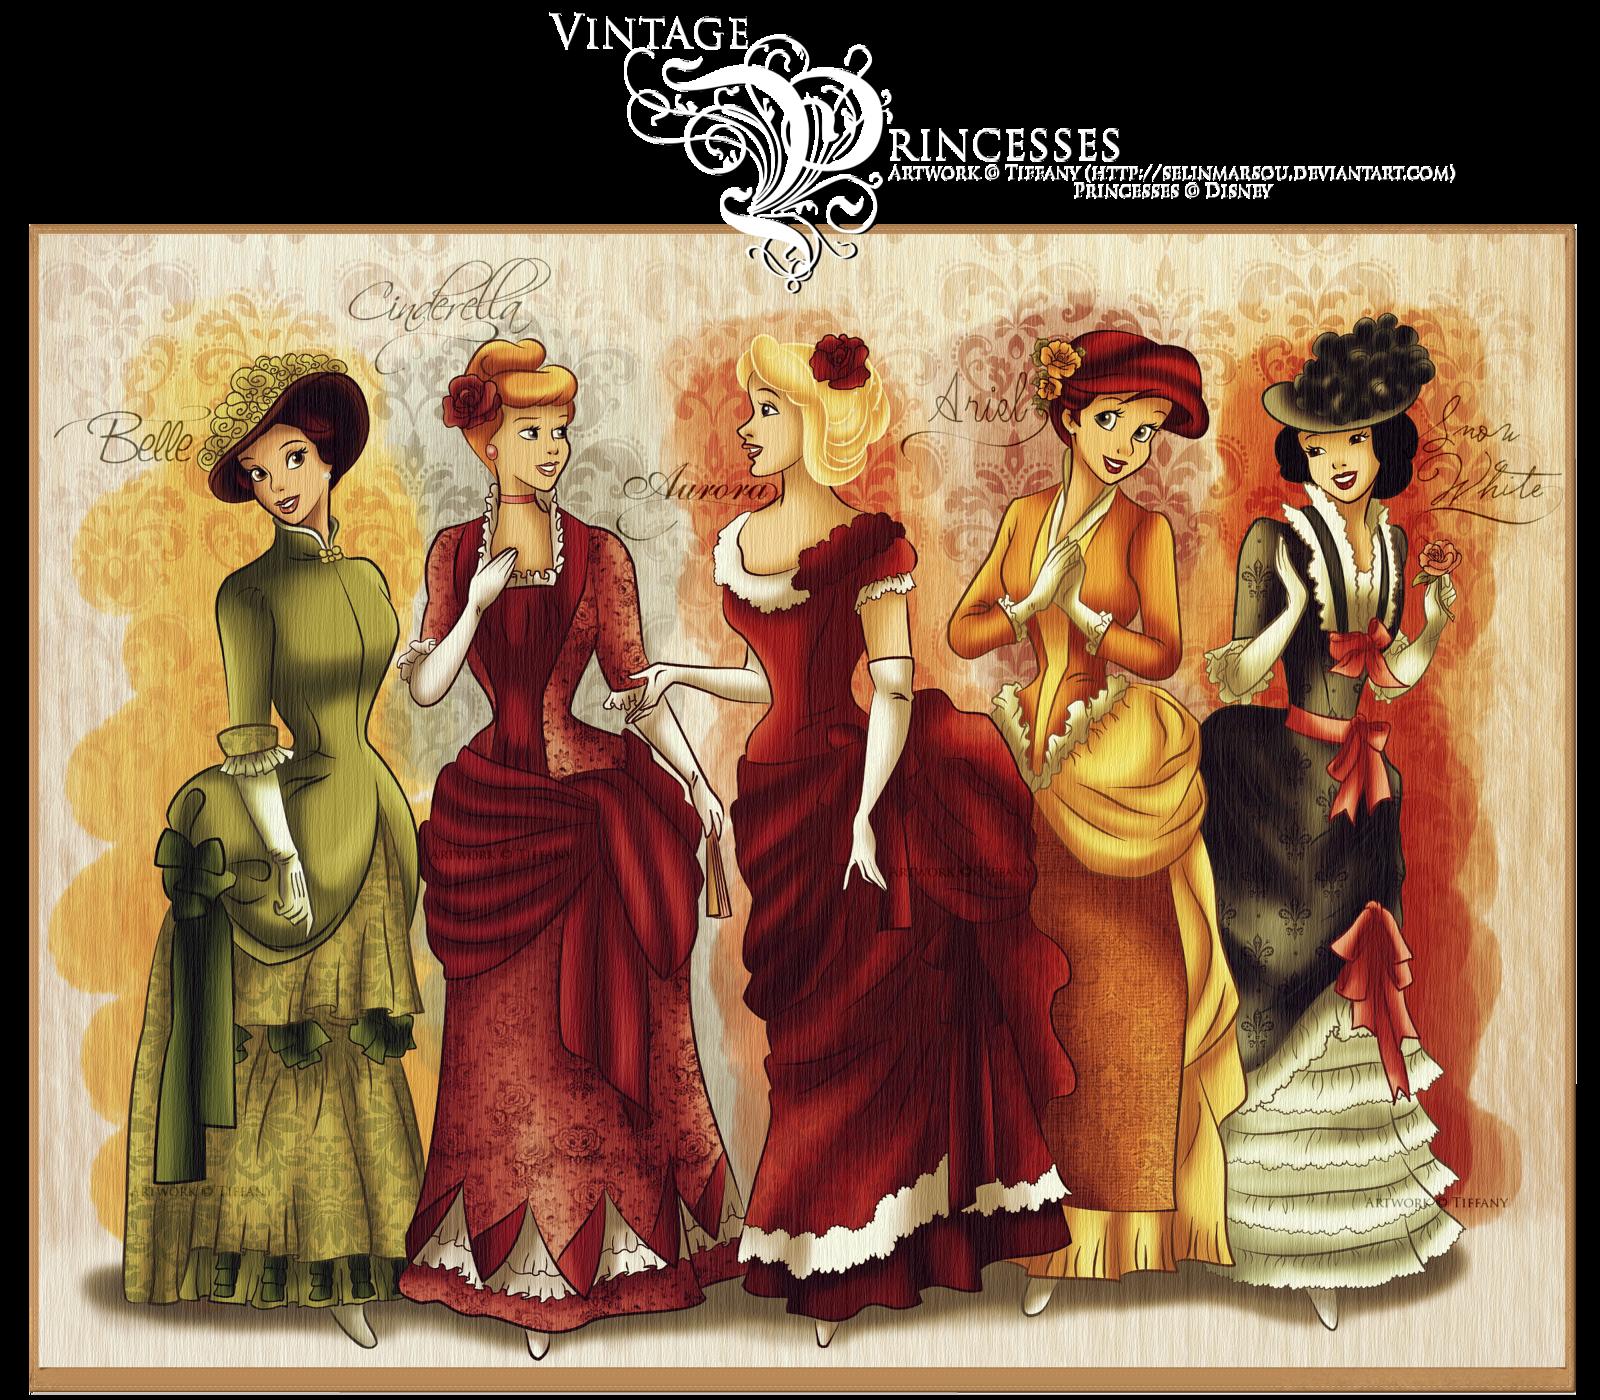 Vintage Princesses